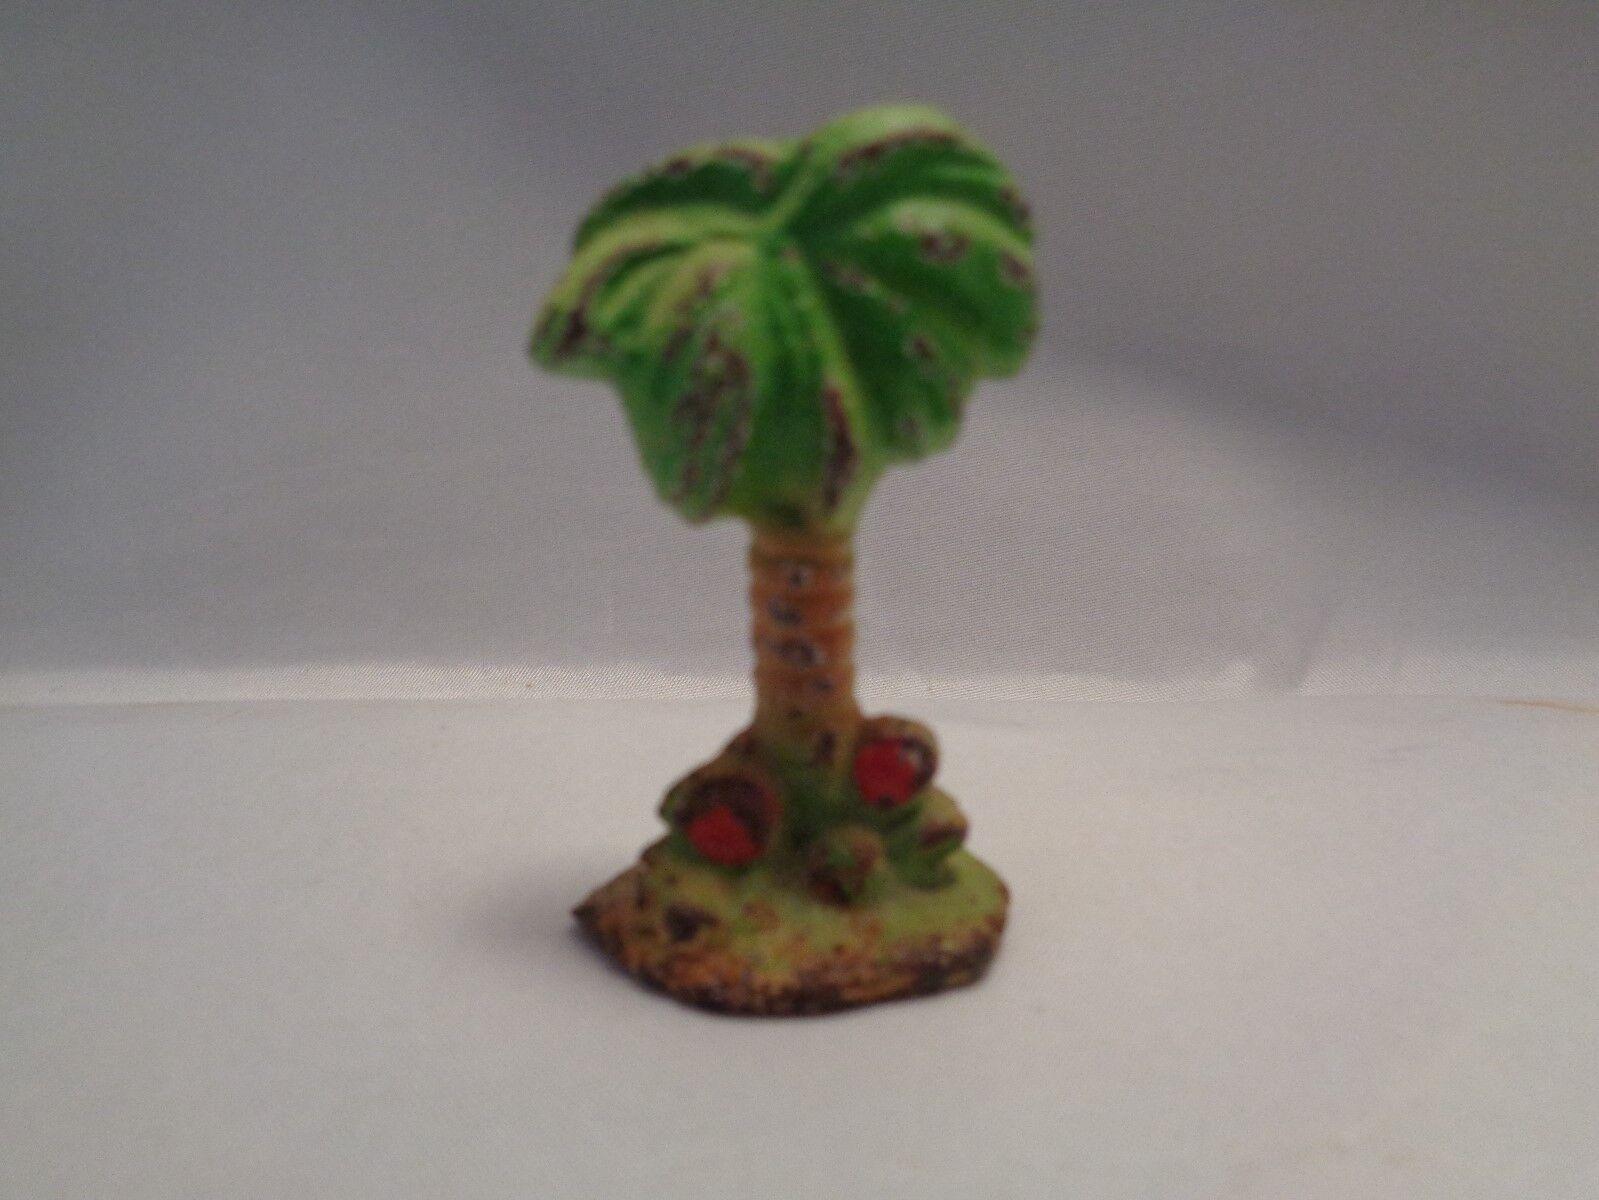 Antiguo Rara Miniatura Hierro Fundido Palmera